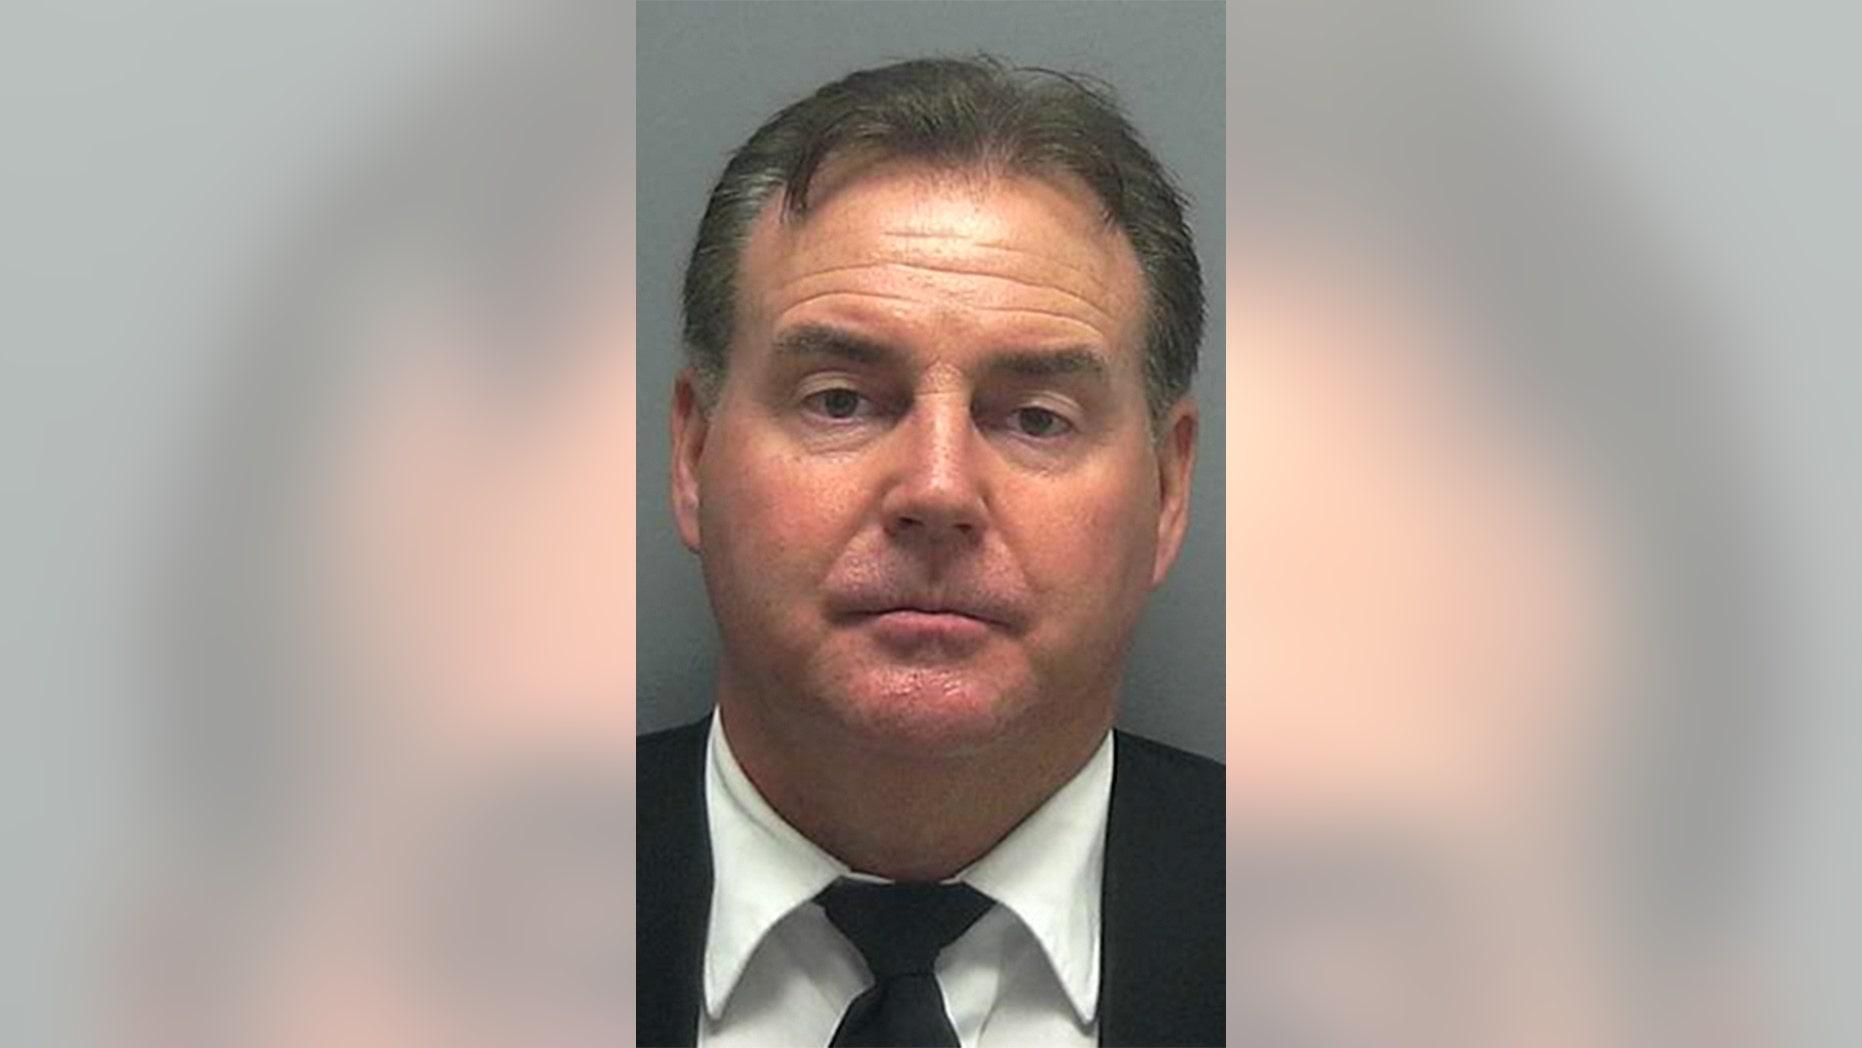 Brian Andrew Machtemes of Minnetonka, Minn., was arrested Friday at Southwest Florida International Airport.